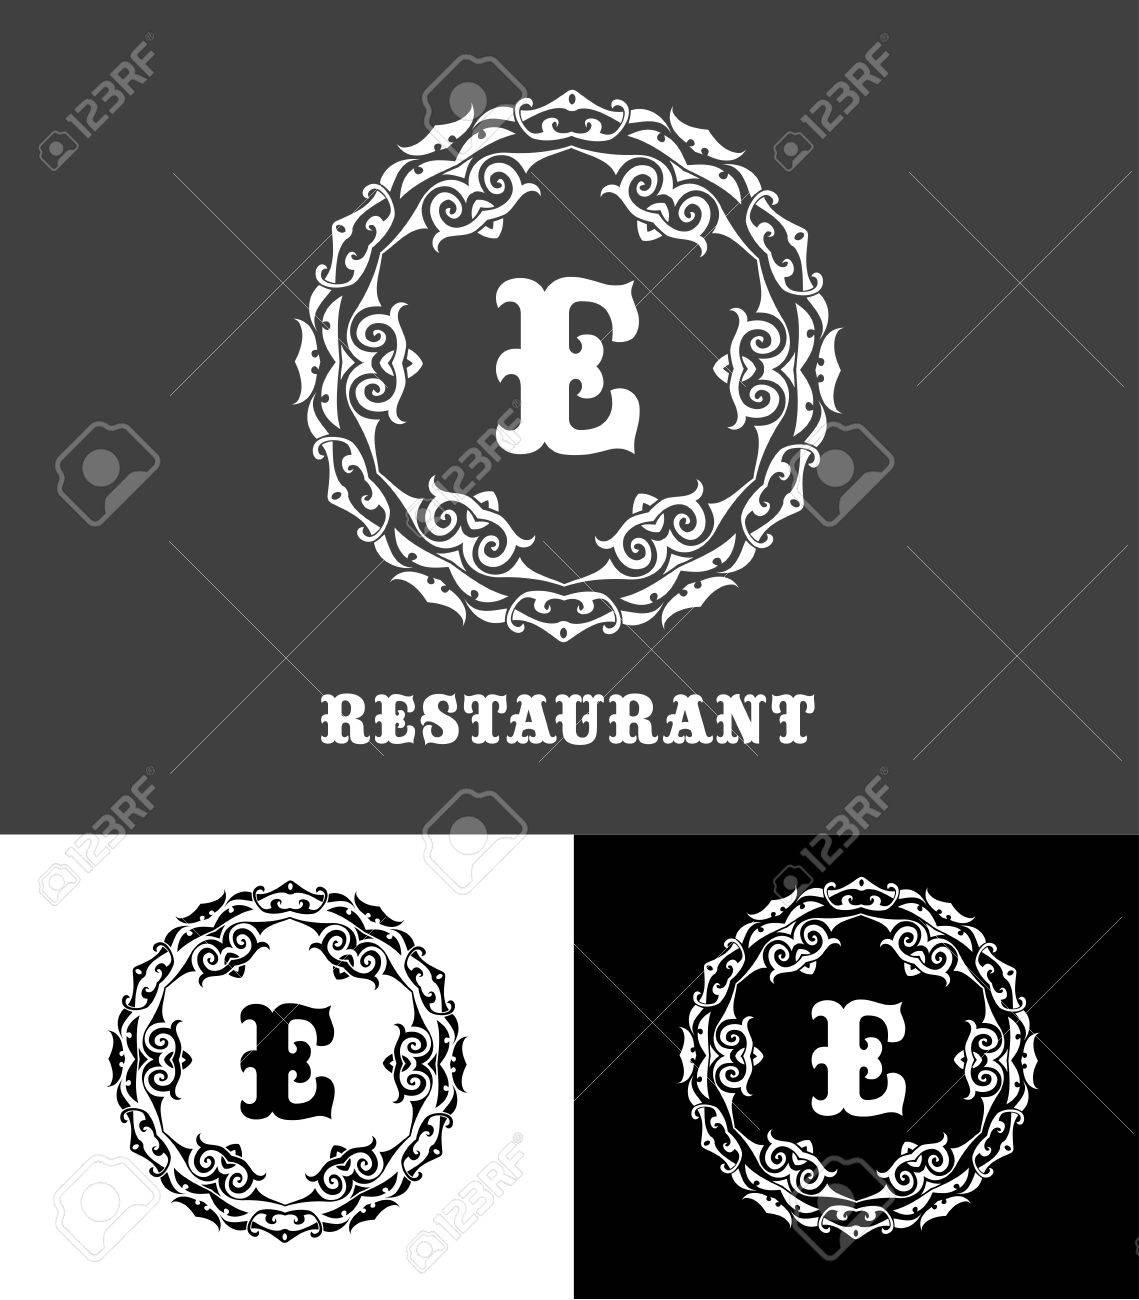 Monogram logo template with calligraphic elegant ornament identity monogram logo template with calligraphic elegant ornament identity design with e letter for shop altavistaventures Images